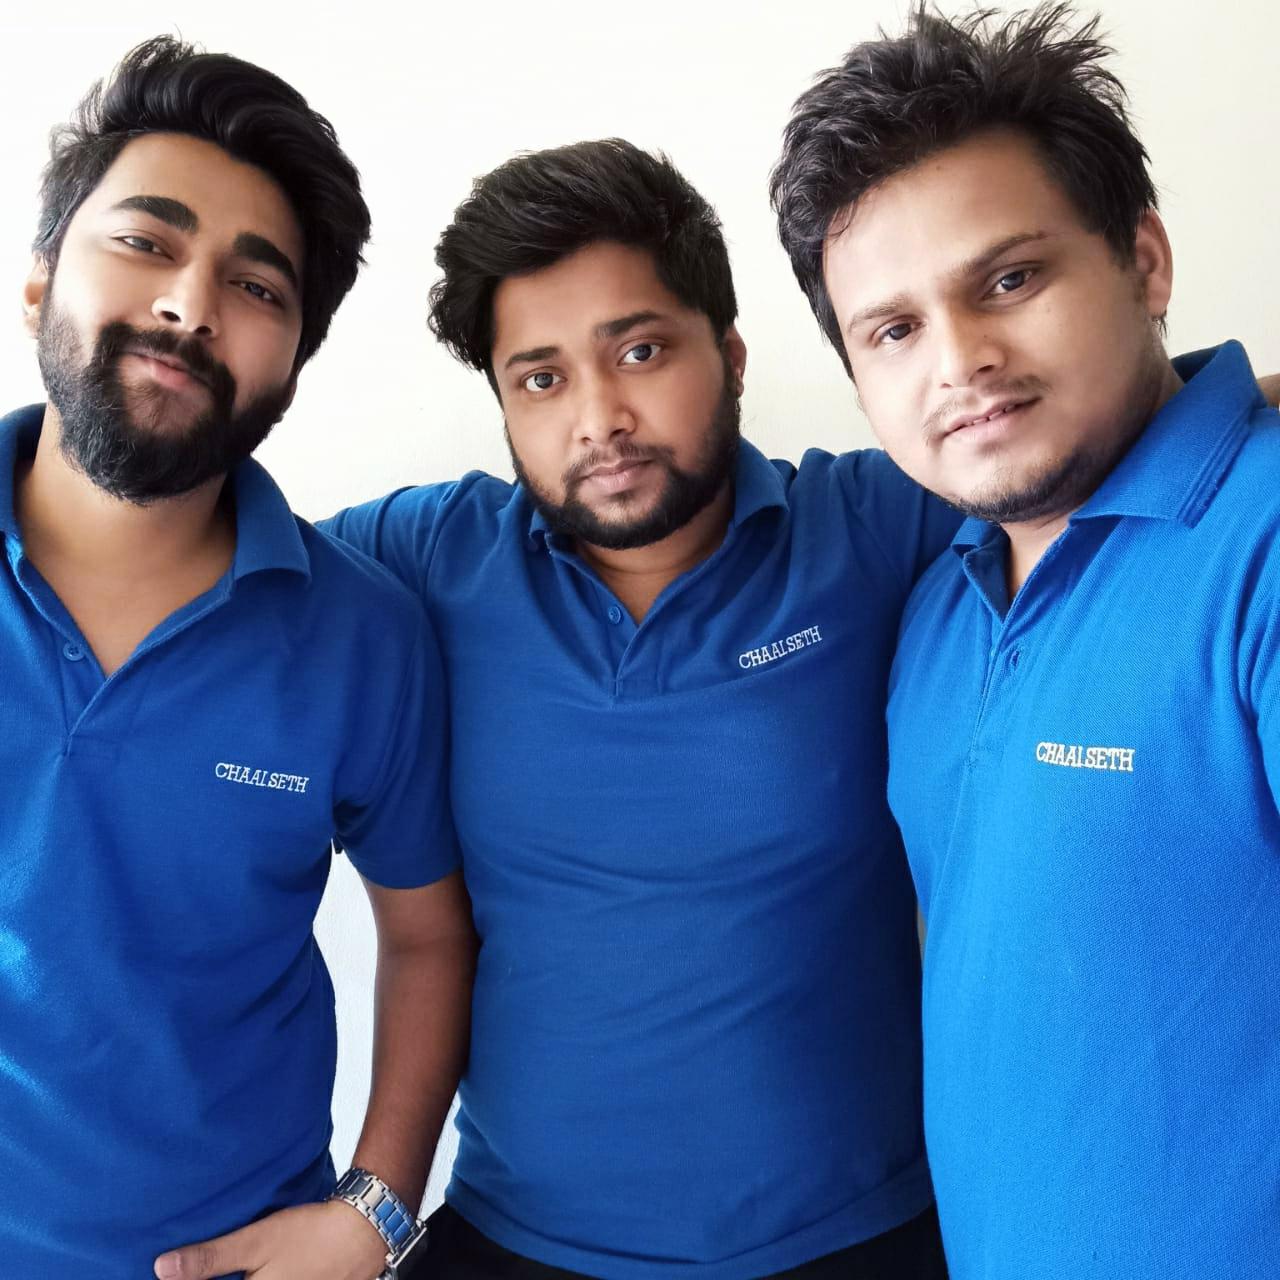 Core Team